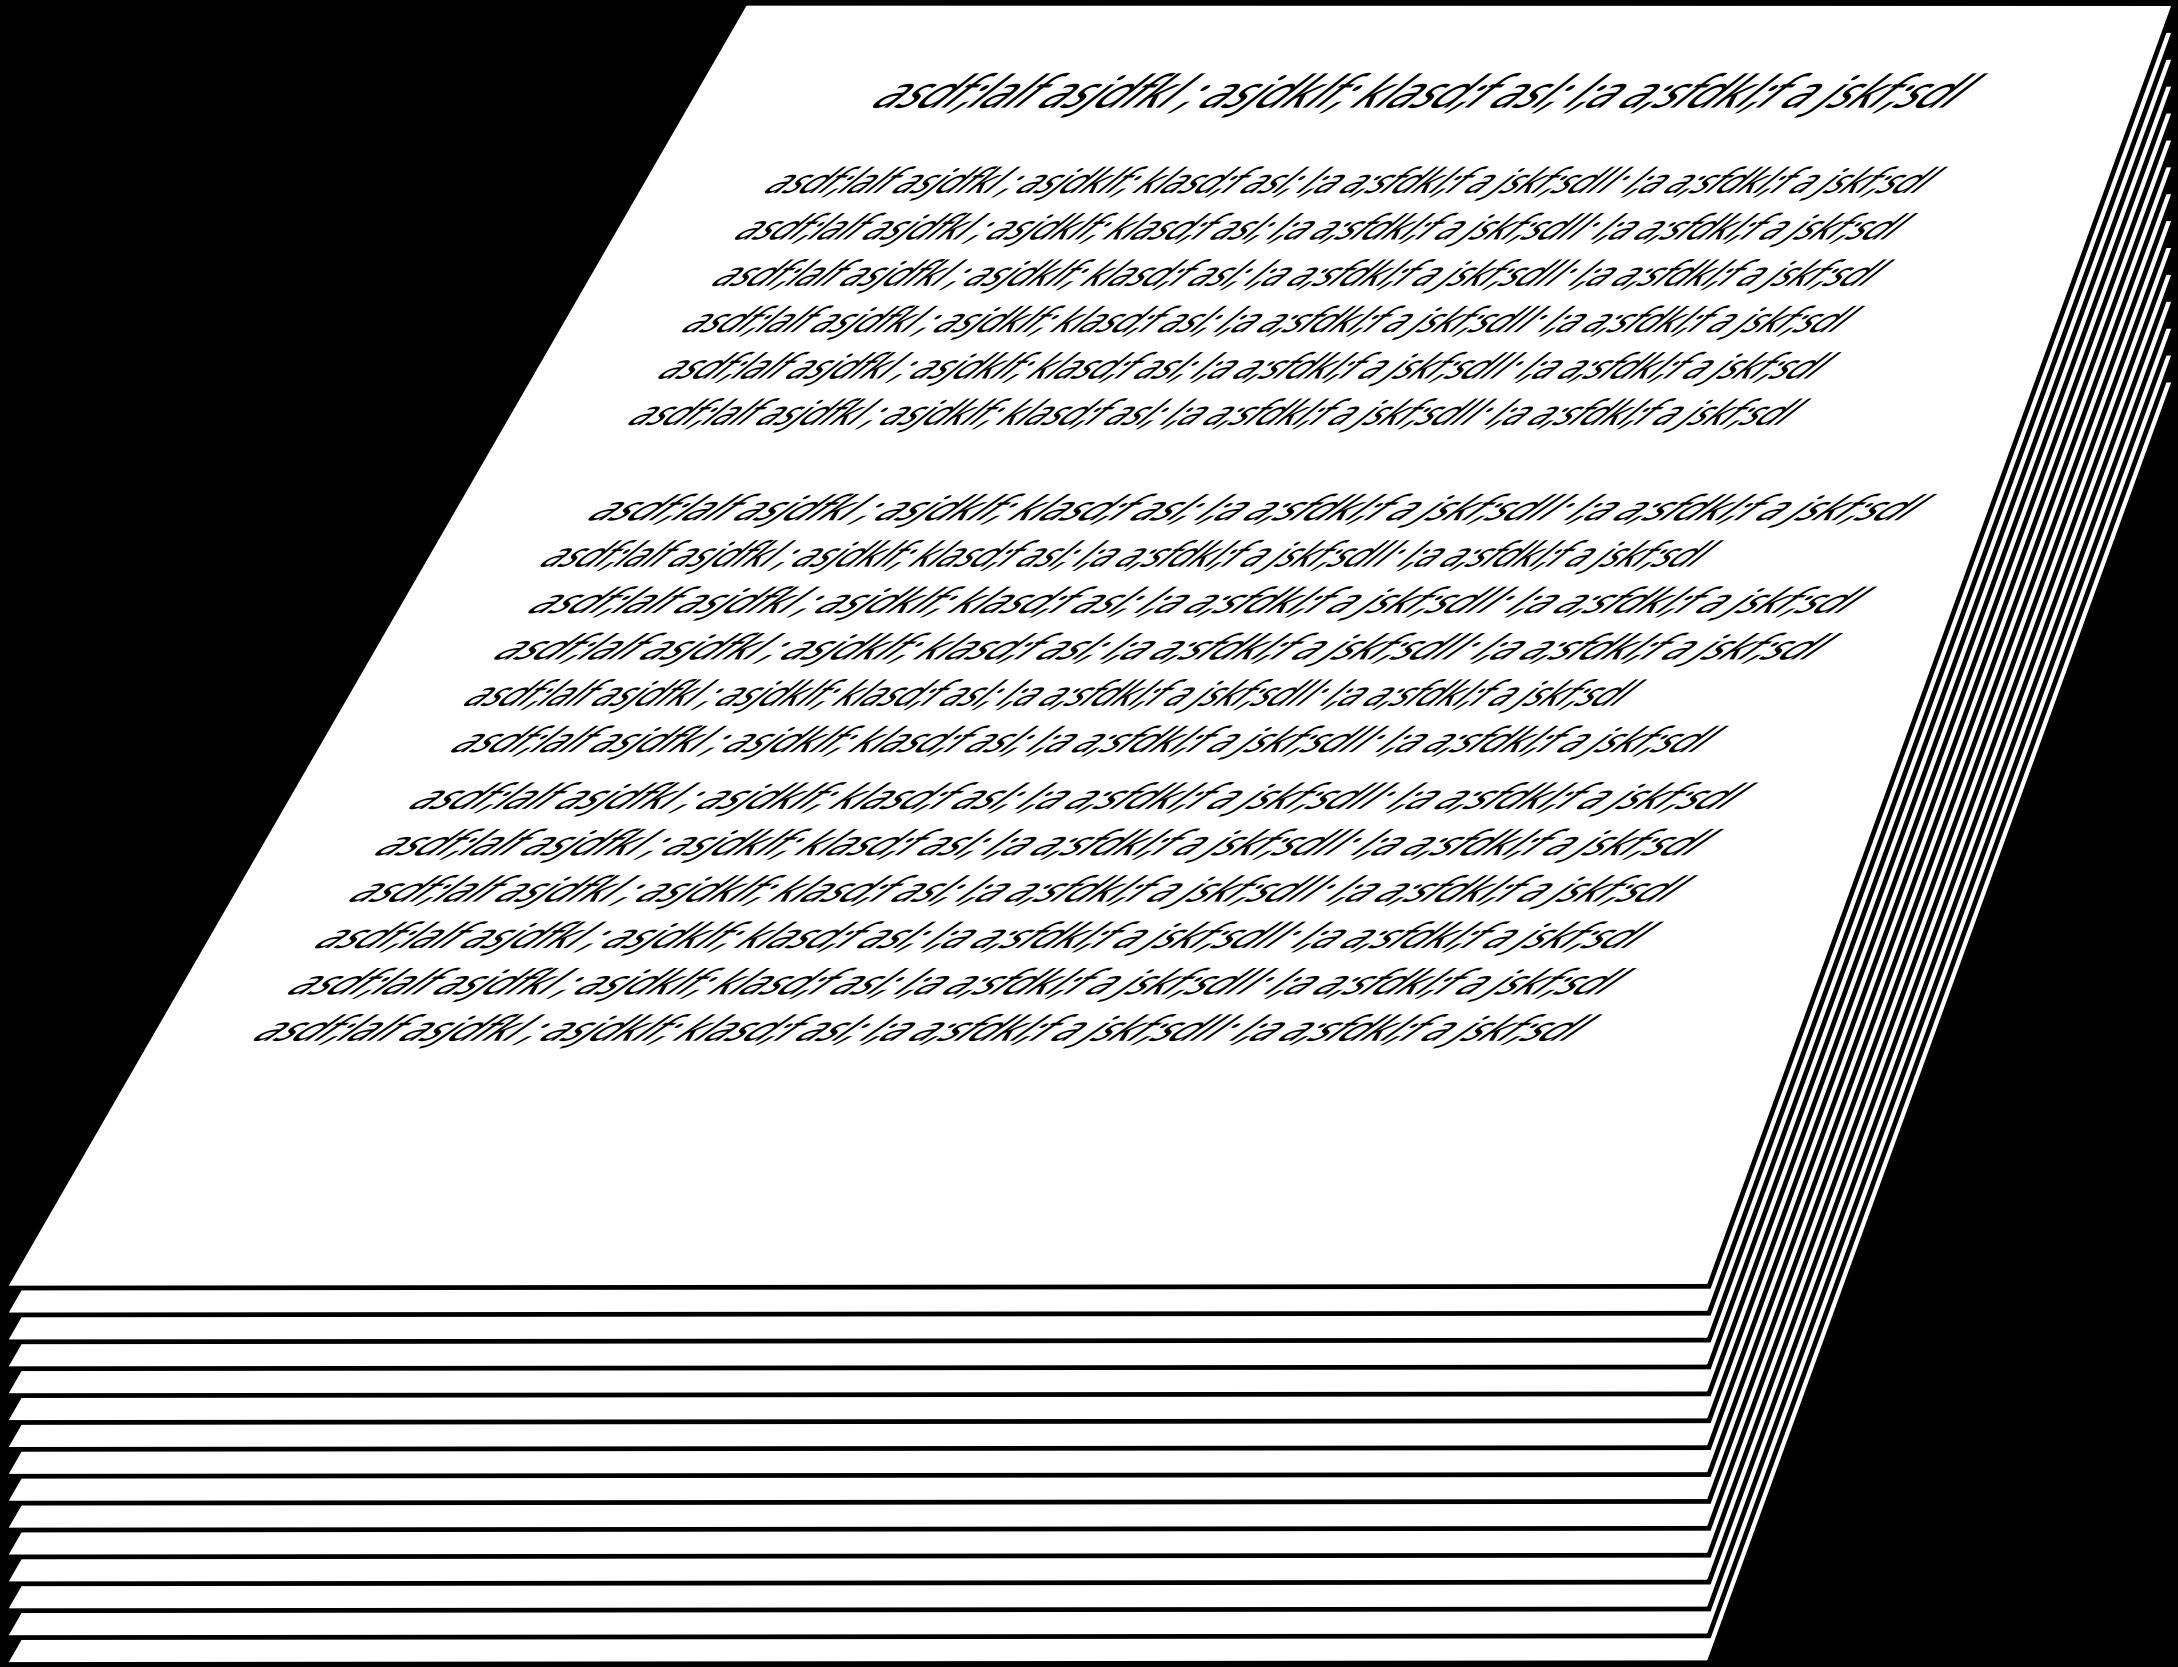 Clipart paper paper pile. Manuscript manuscrit big image